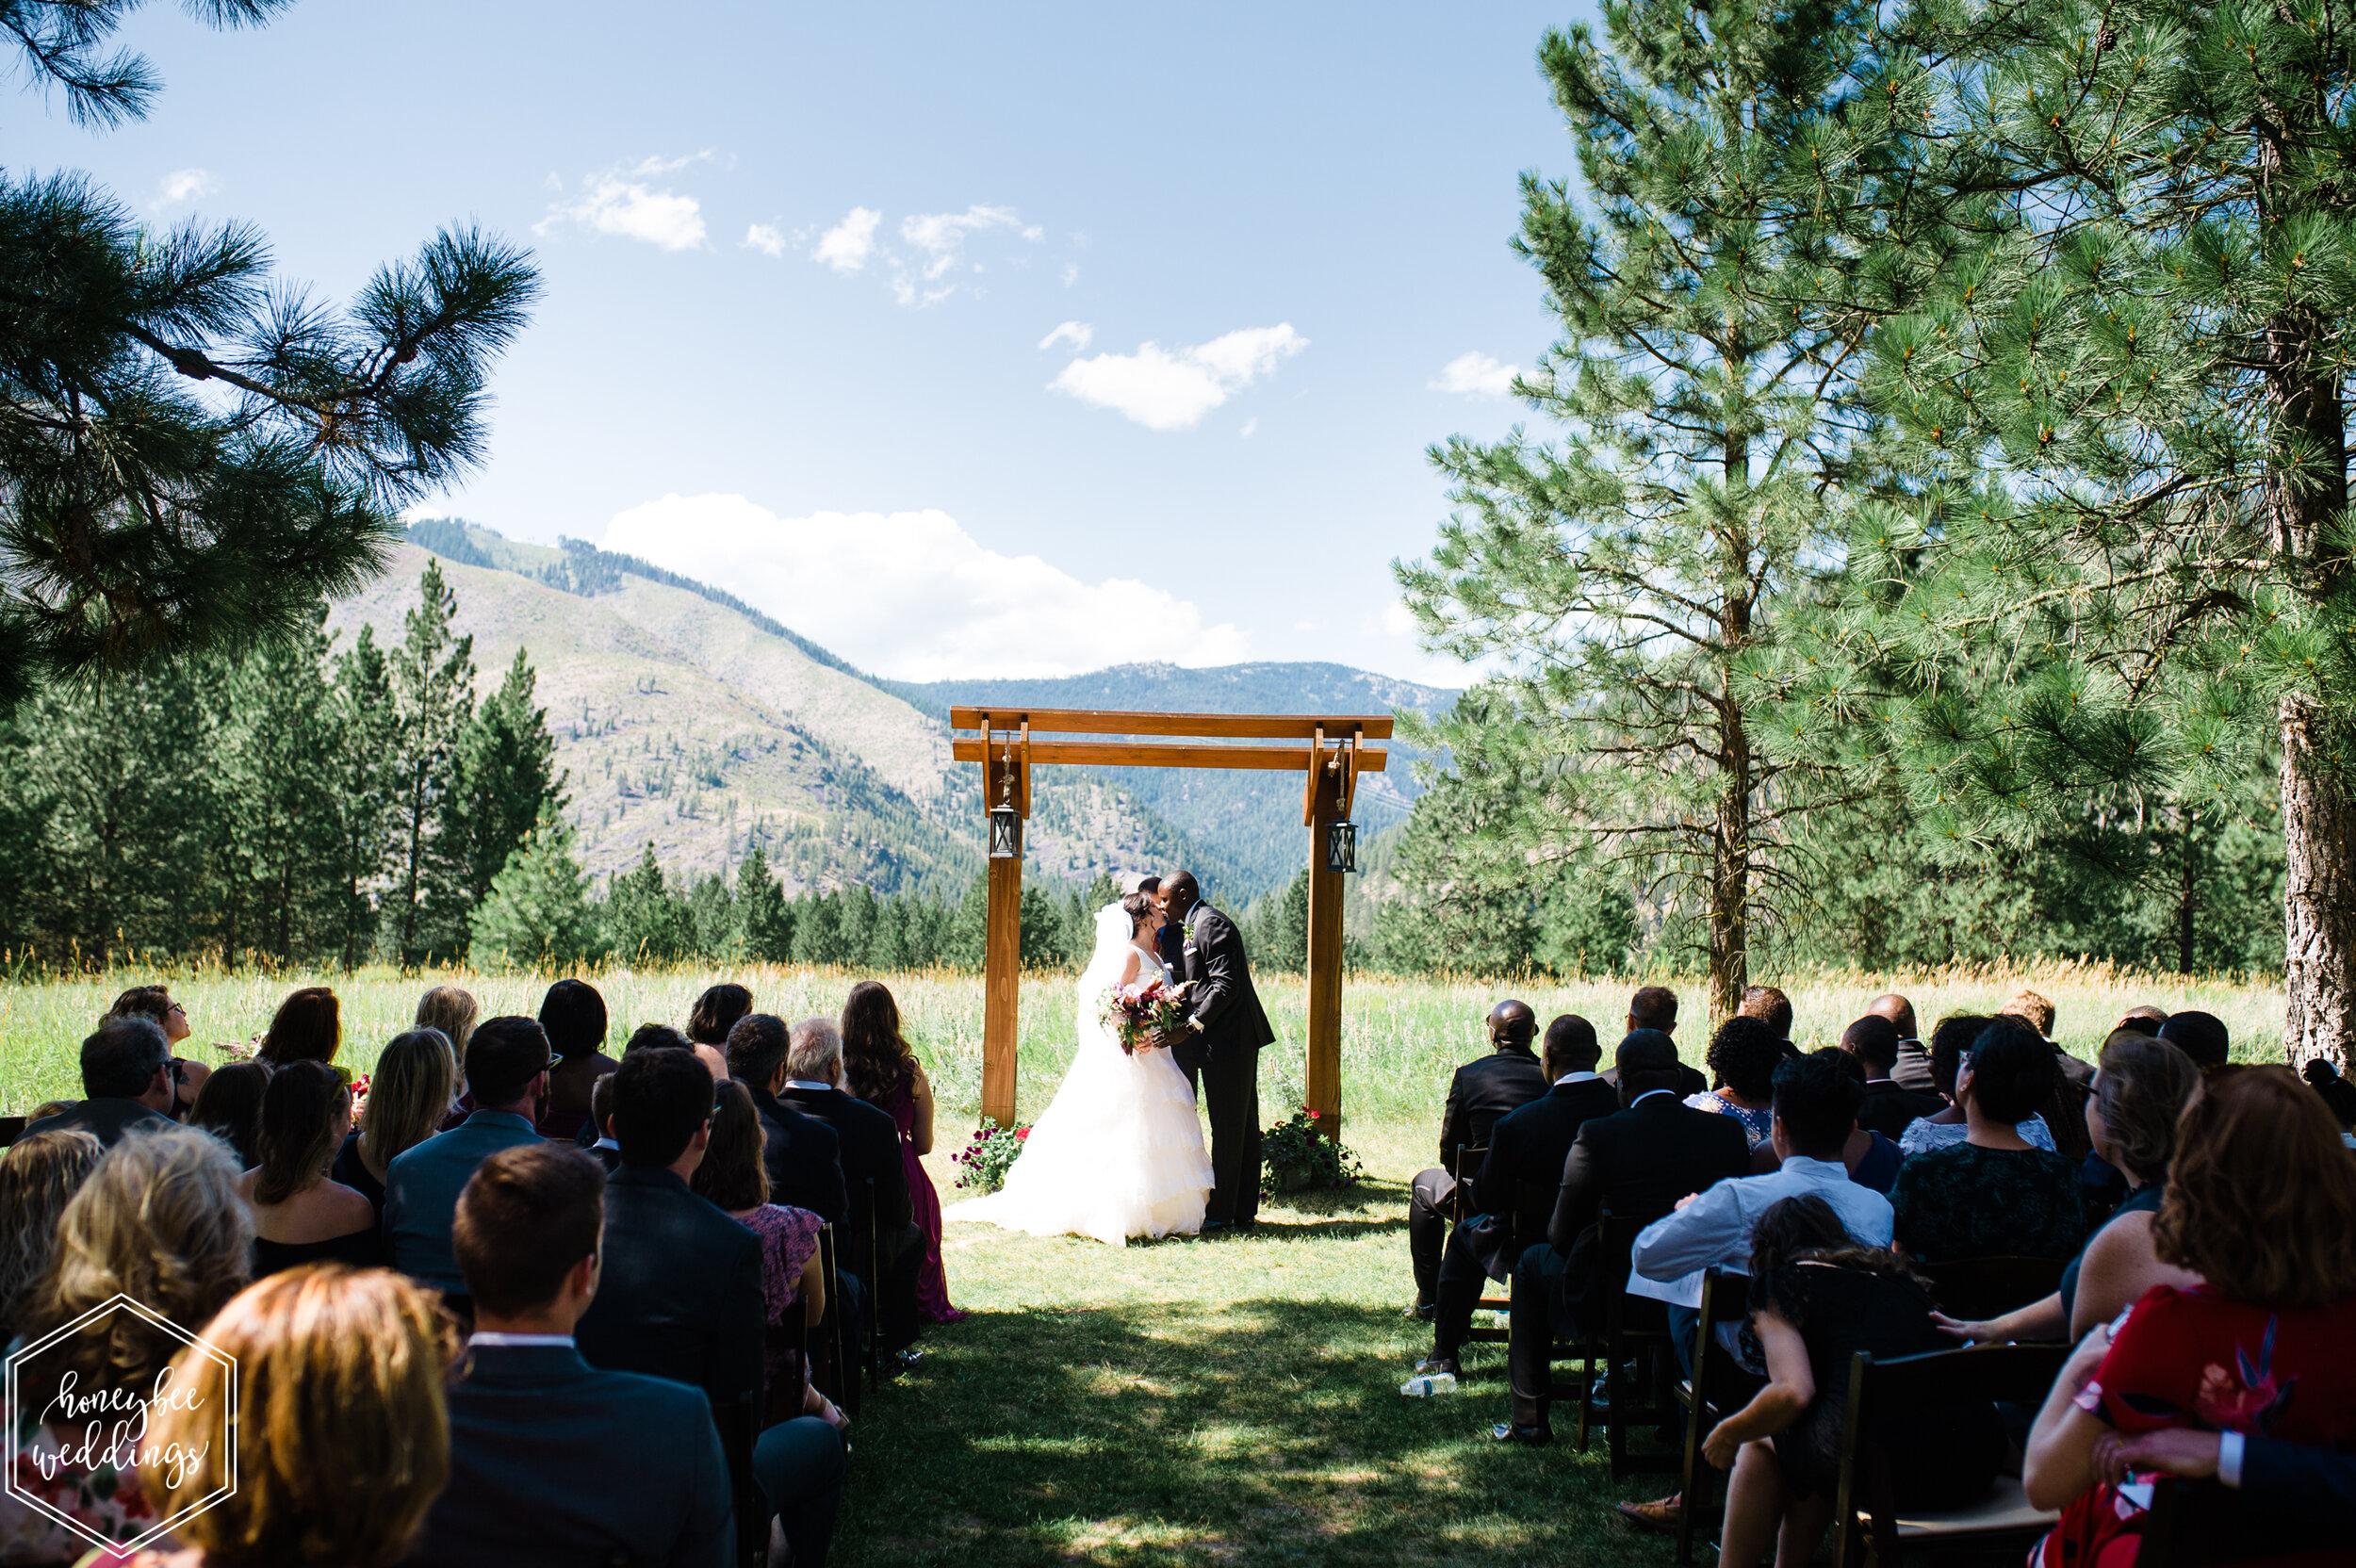 059White Raven Wedding_Montana Wedding Photographer_Rebekah & Likom_Honeybee Weddings_July 27, 2019-817.jpg